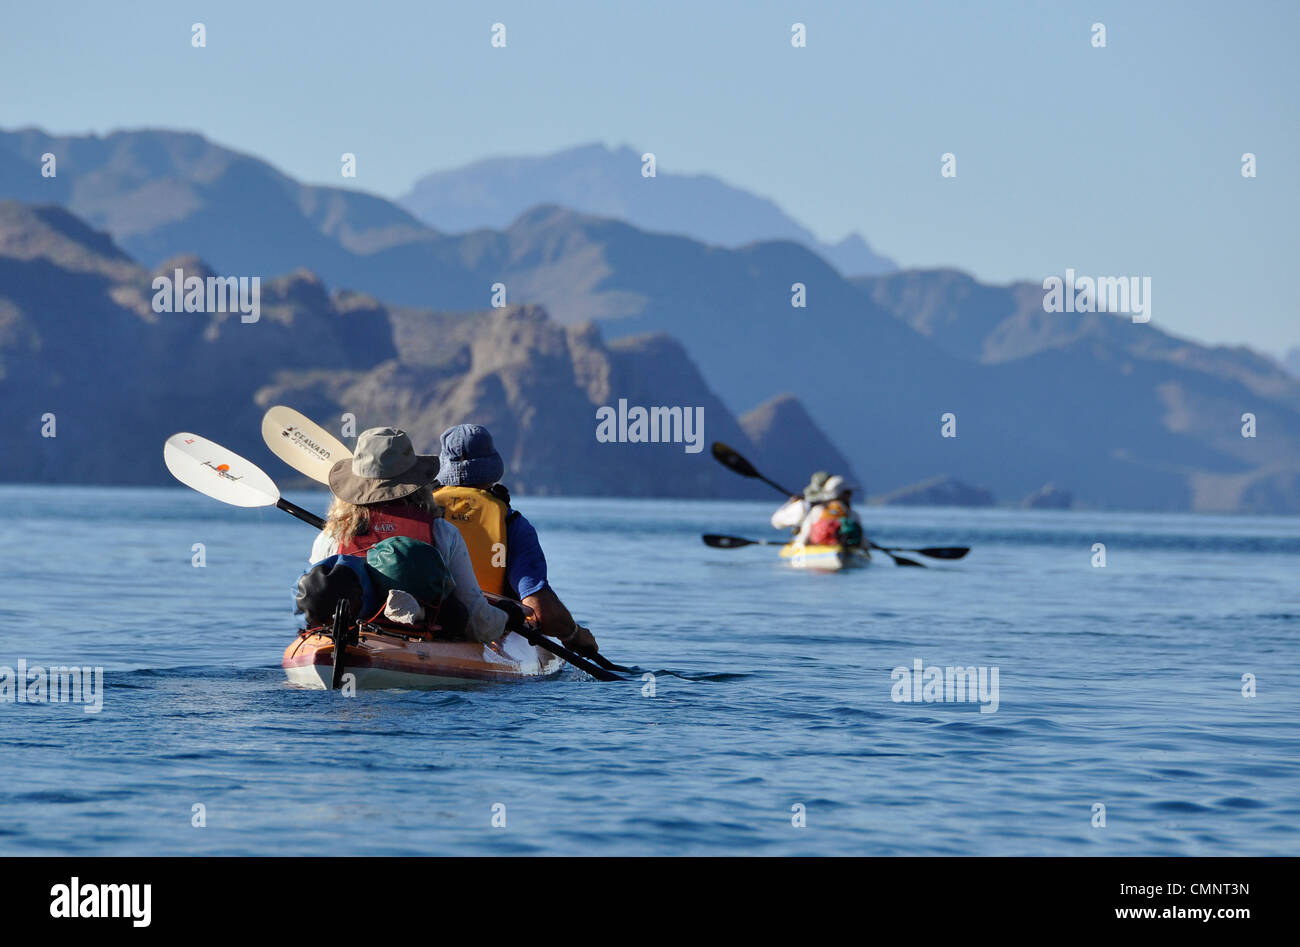 Sea kayaking in the Sea of Cortez, Loreto Bay National Park, Baja California, Mexico. - Stock Image